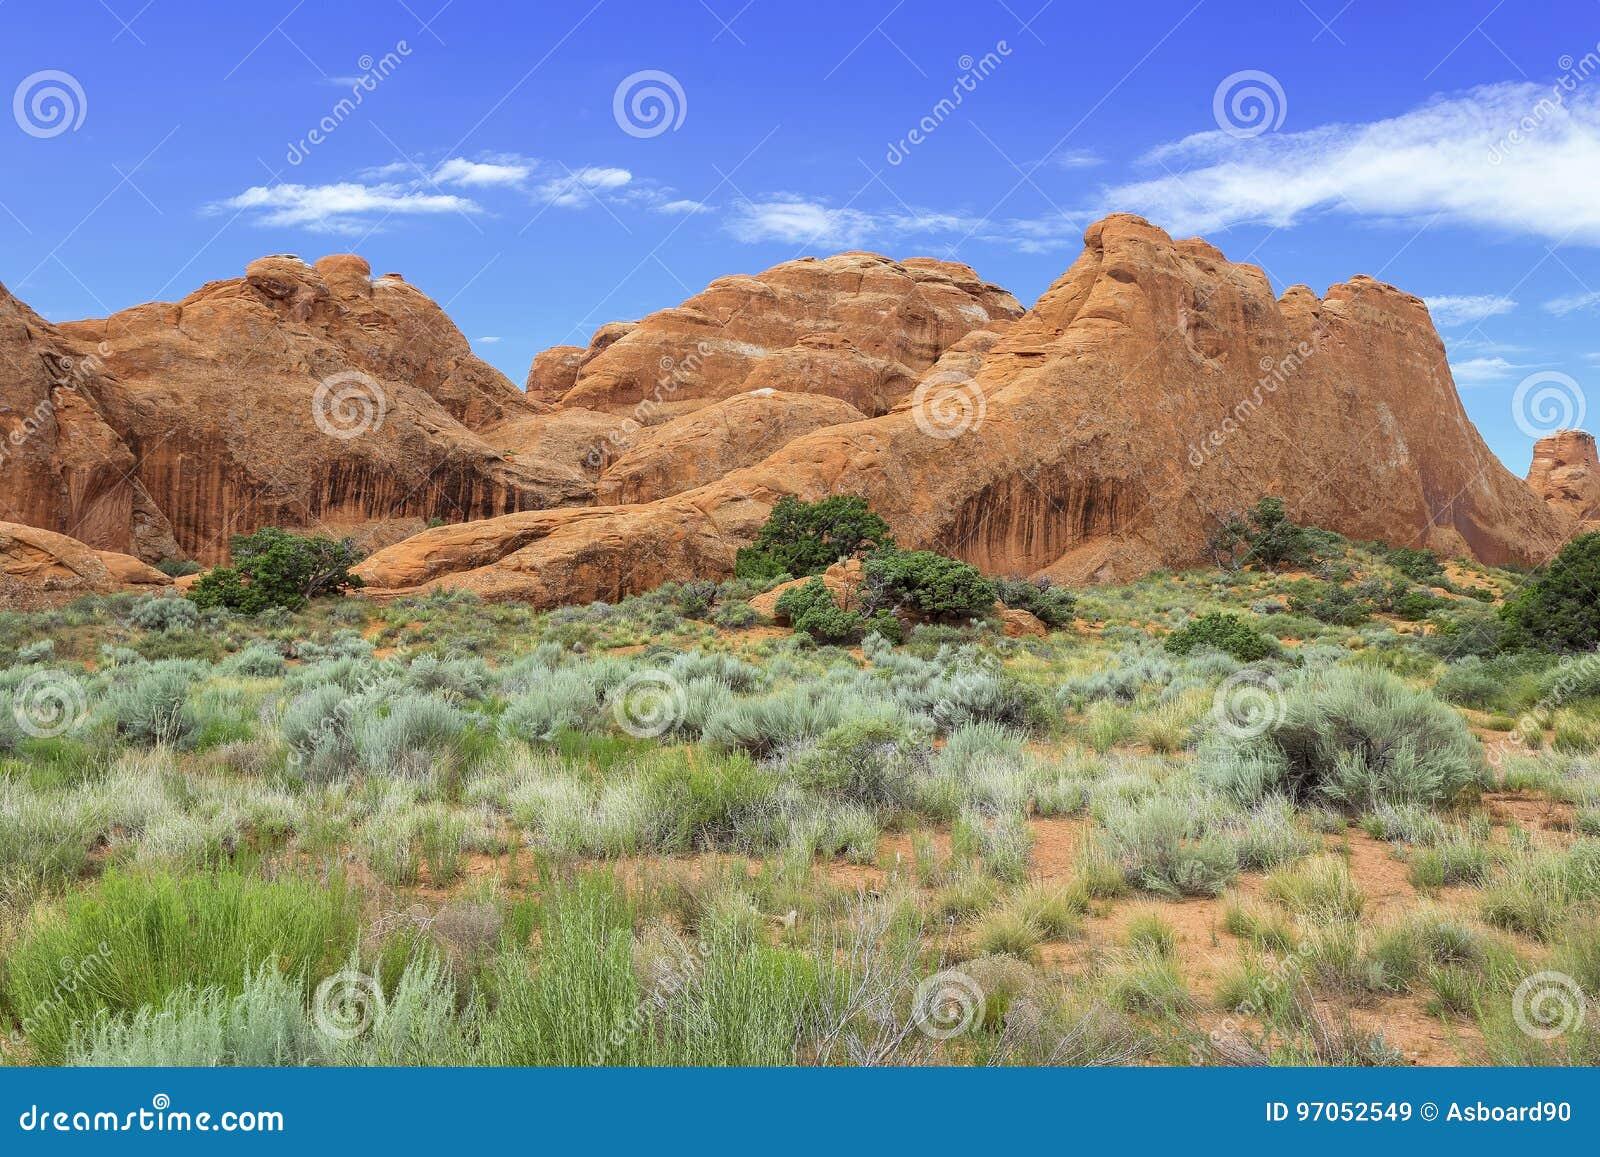 Devils Garden Trail, Arches National Park, Utah